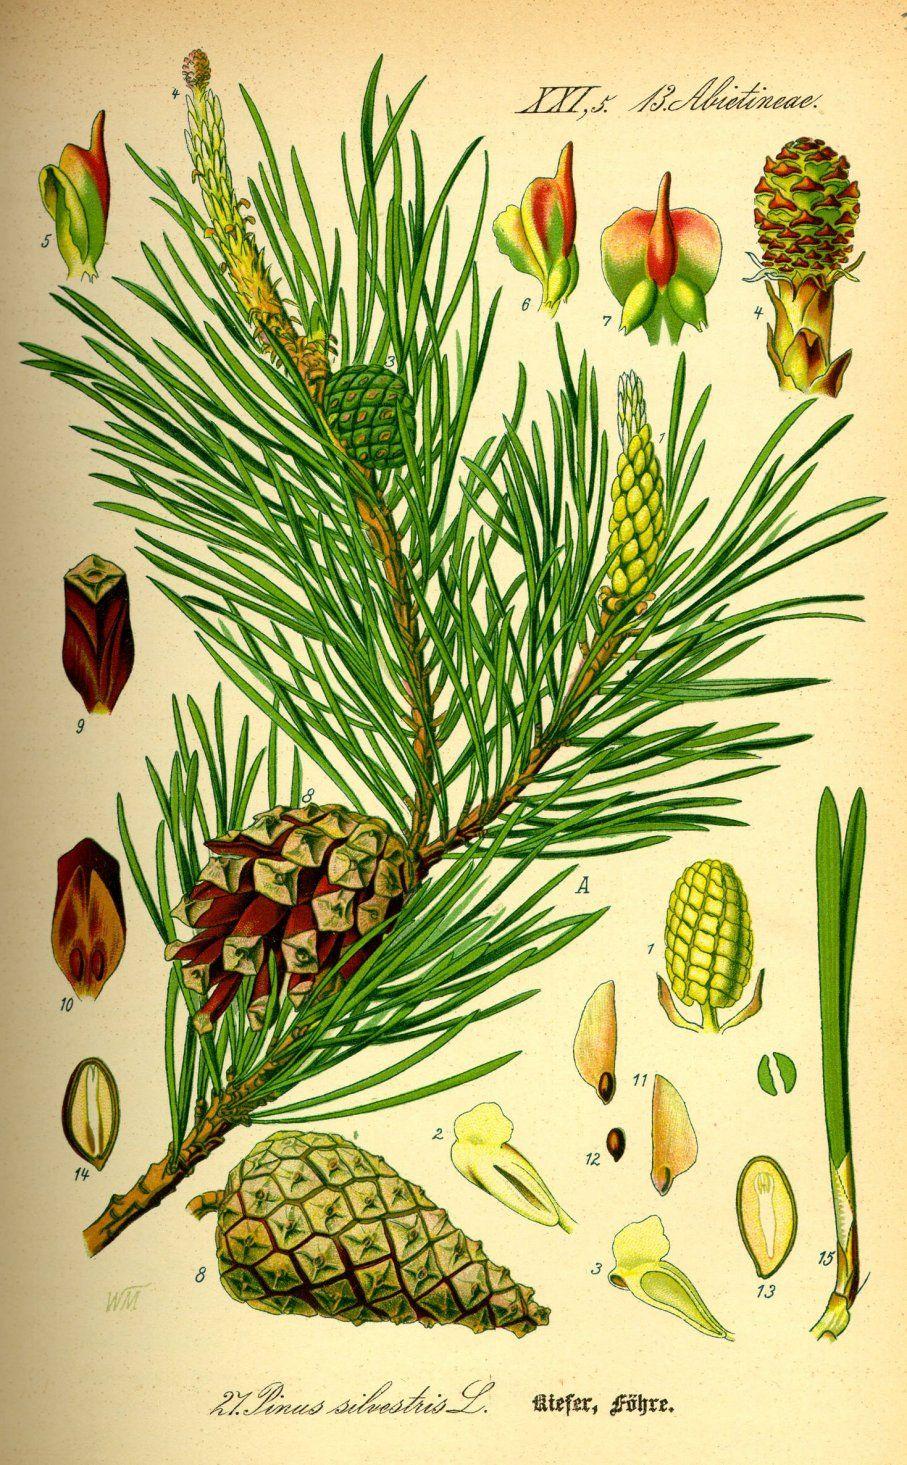 Grove den - Pinus sylvestris | Bachbloesem | Pinterest | Japon